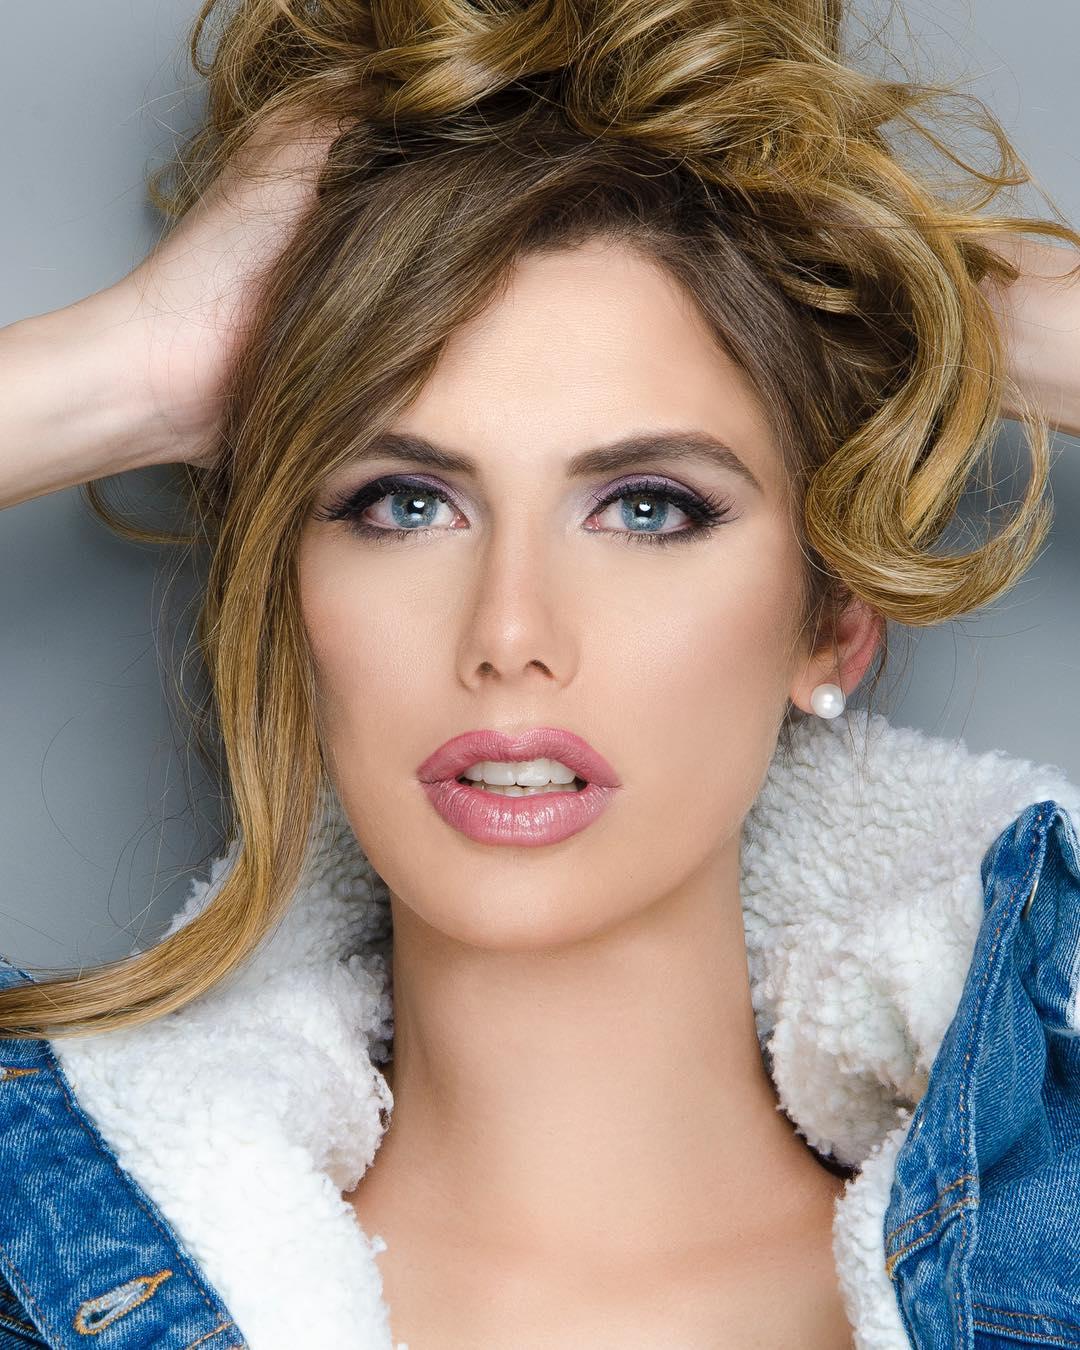 angela ponce, miss espana universo 2018. - Página 4 43779611